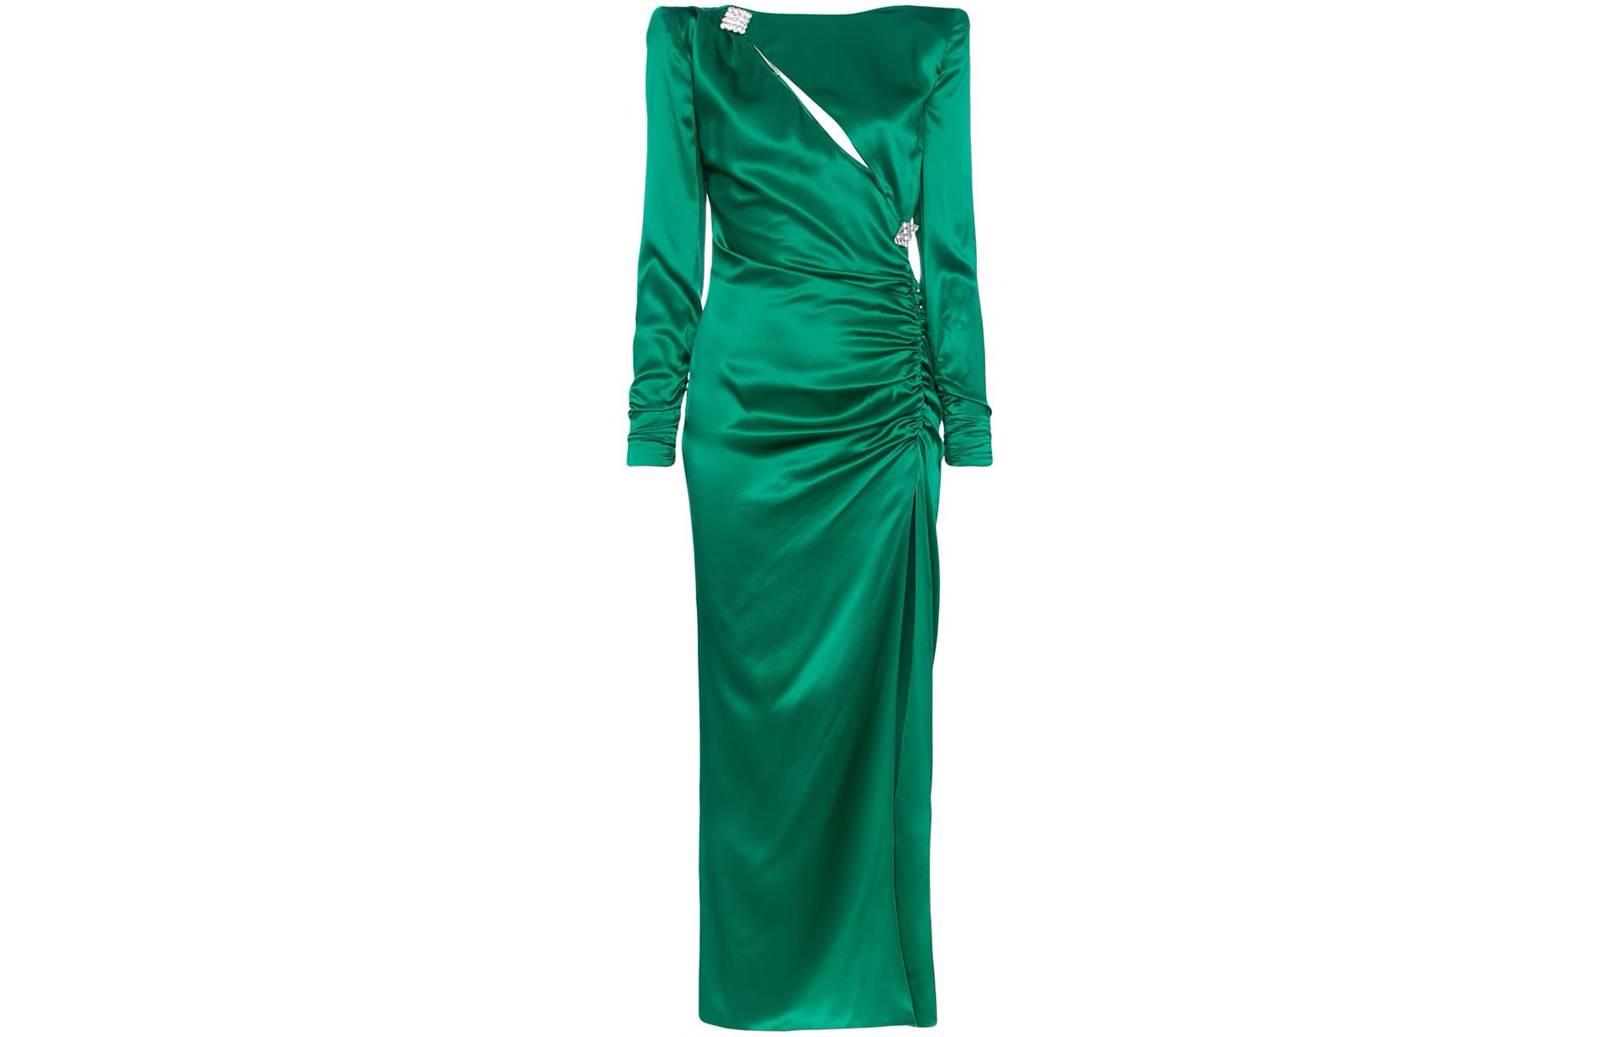 ac59aca1 Best Christmas Party Dresses 2018 | British Vogue